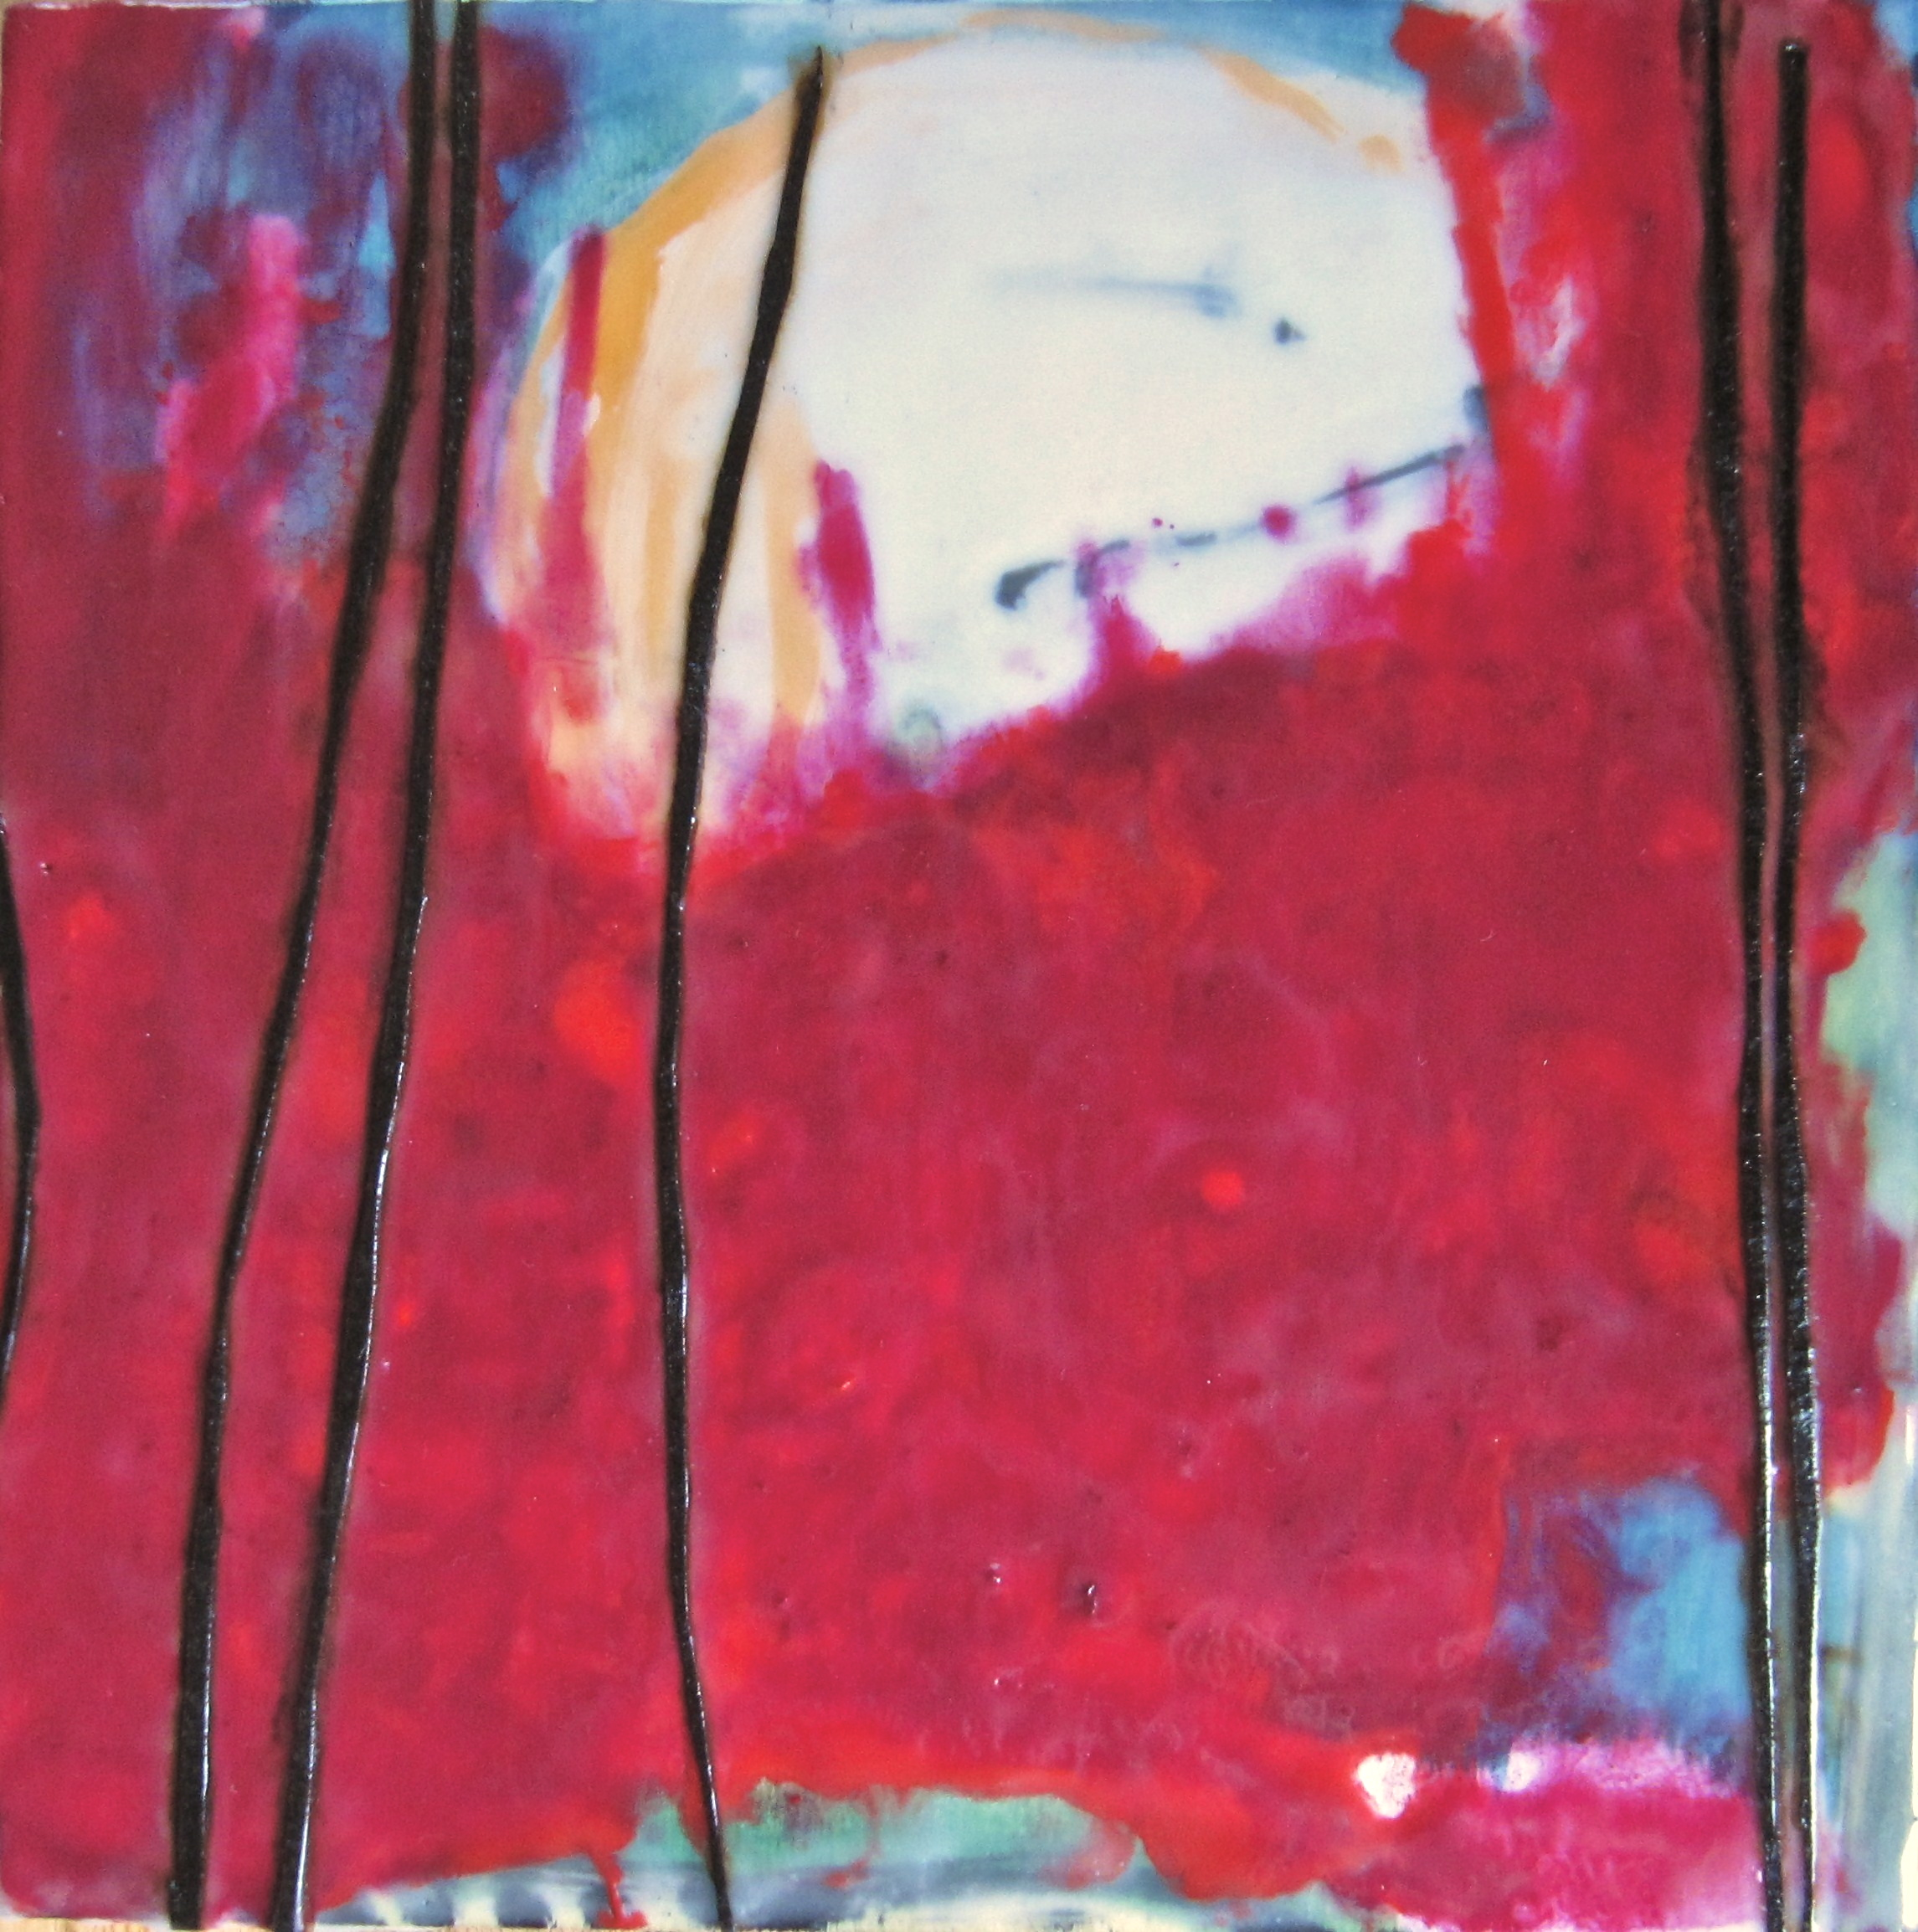 Blood + Water, 2009 / Encaustic on wood panel, 10 x 10 / Sold